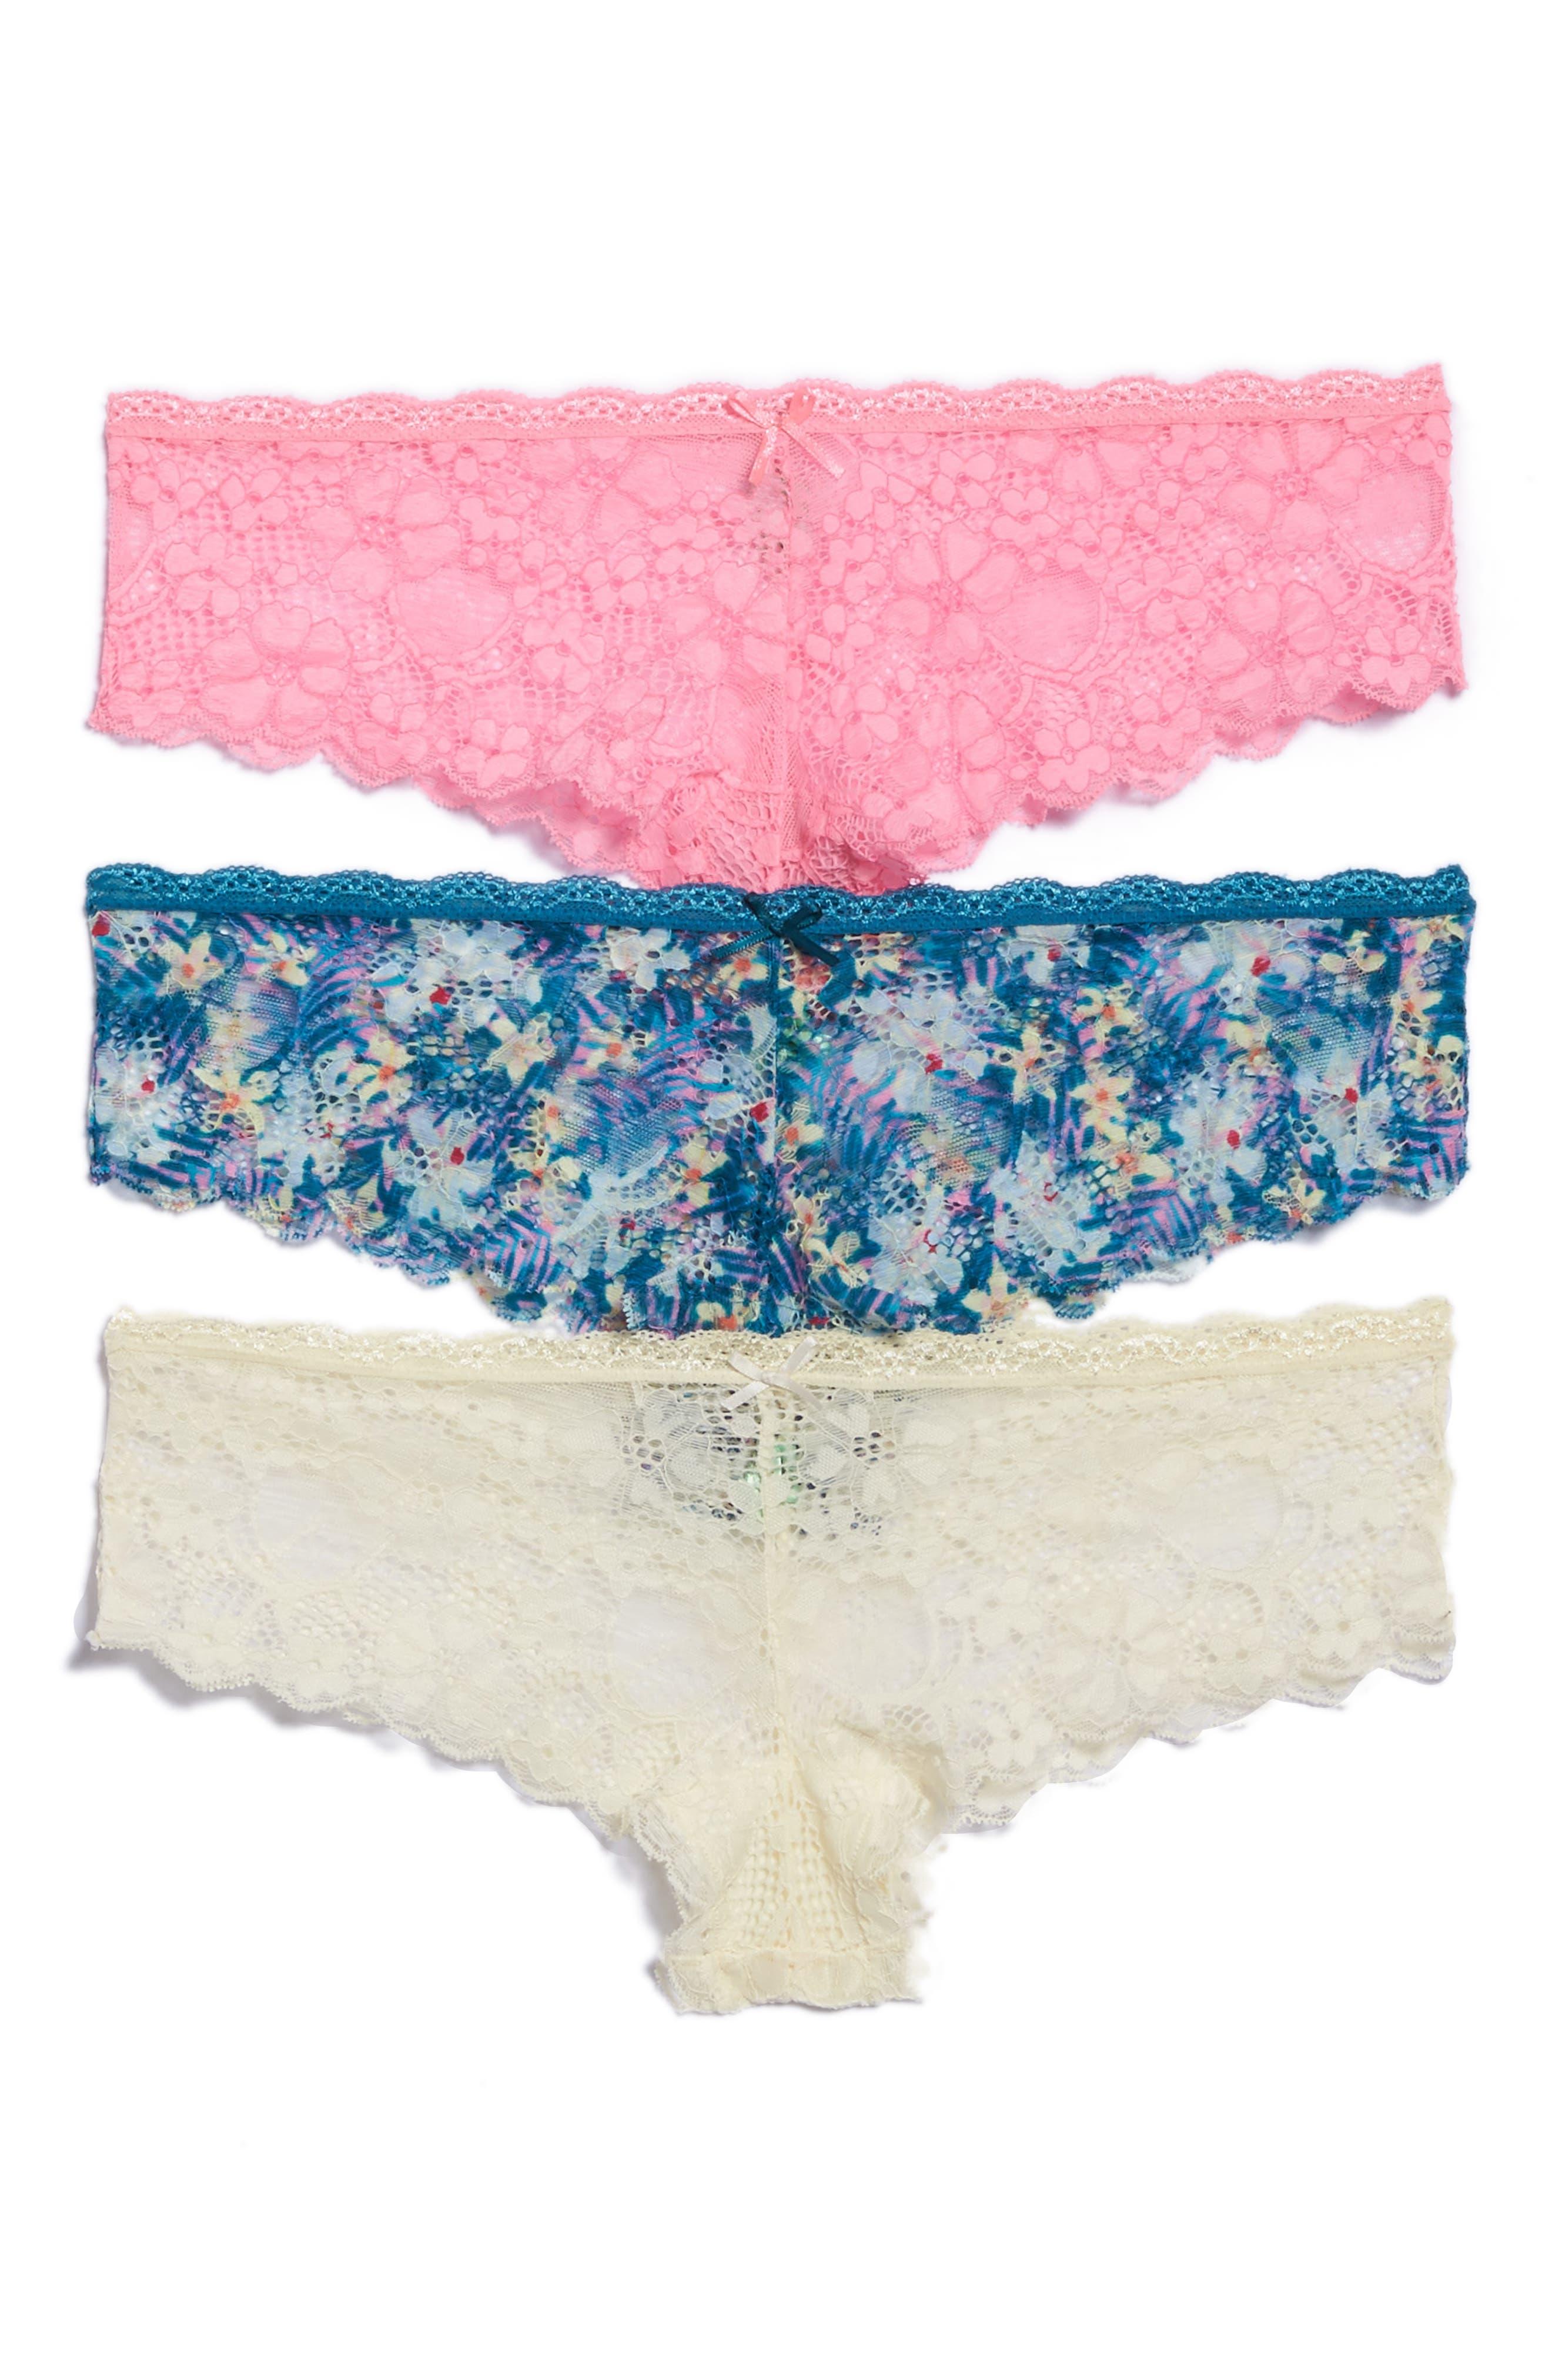 3-Pack Lace Hipster Panties,                             Main thumbnail 3, color,